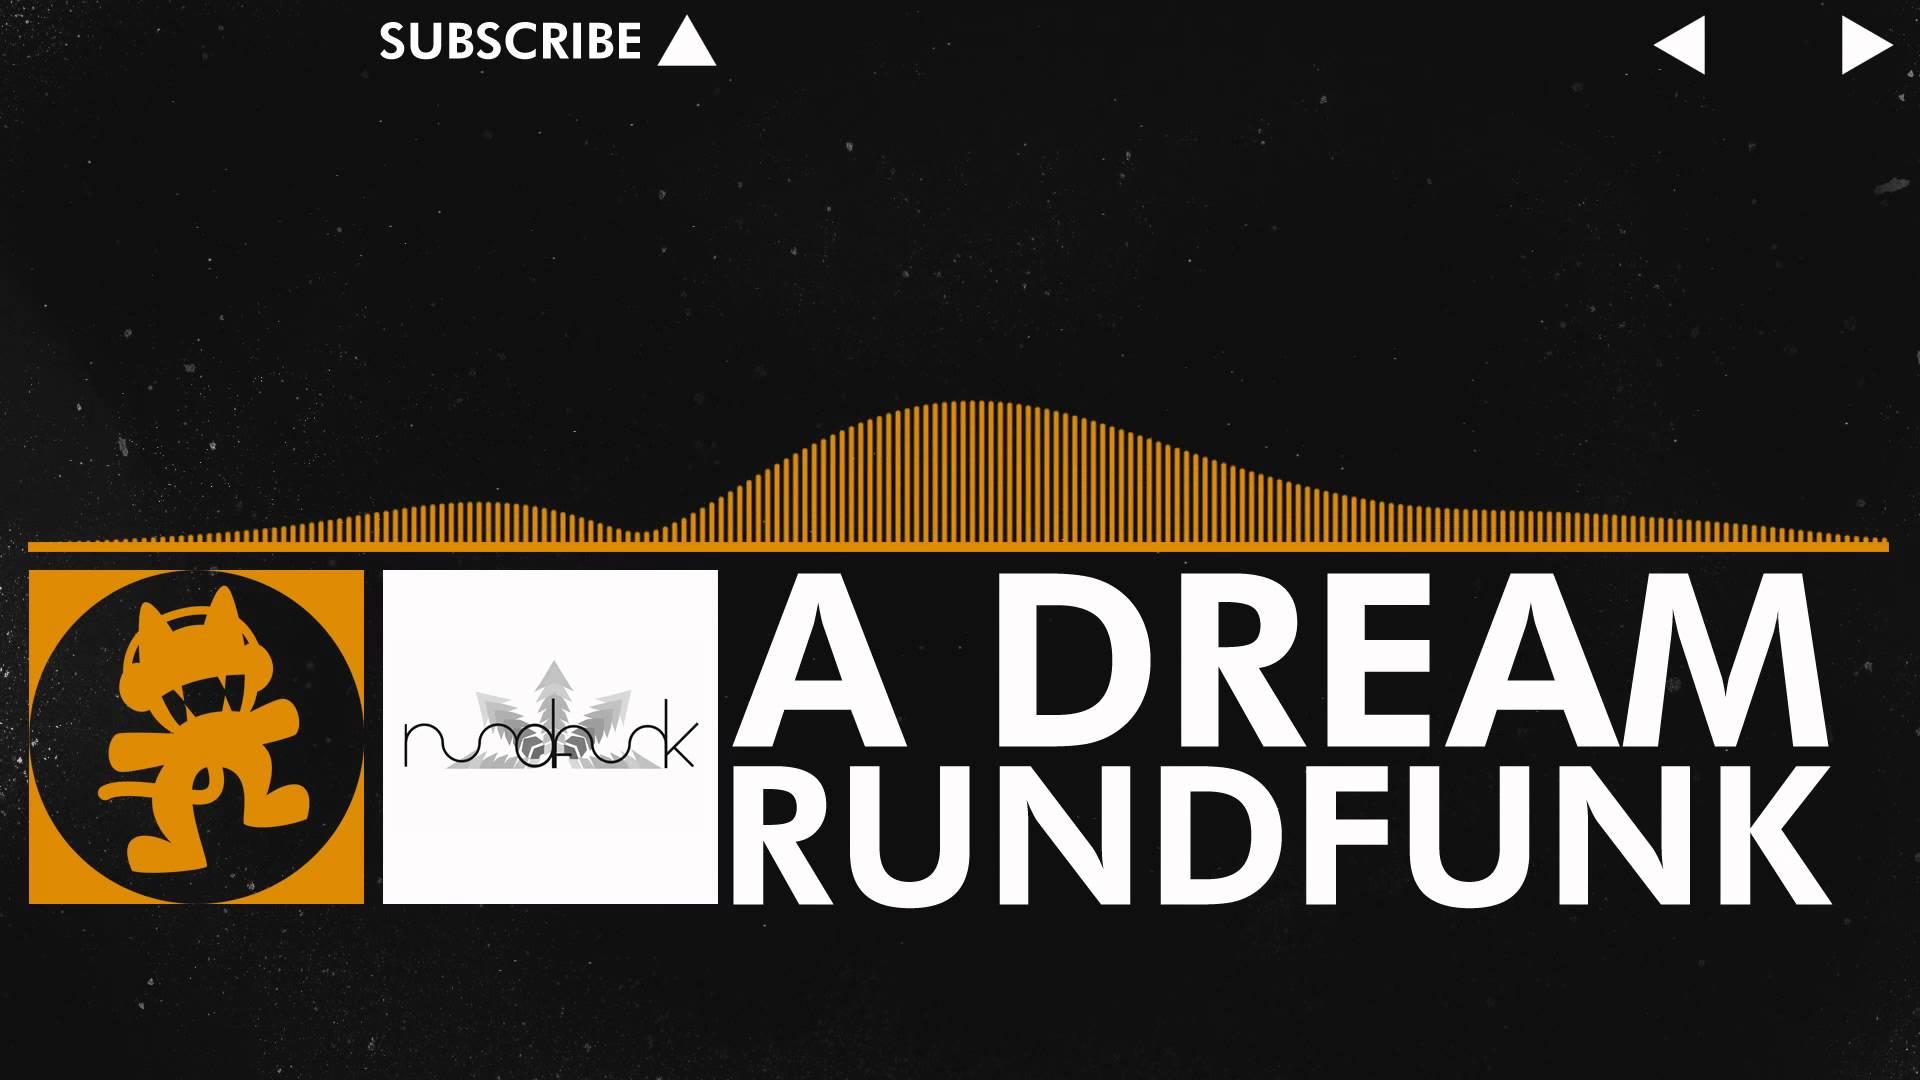 [House] - Rundfunk - A Dream [Monstercat Release]